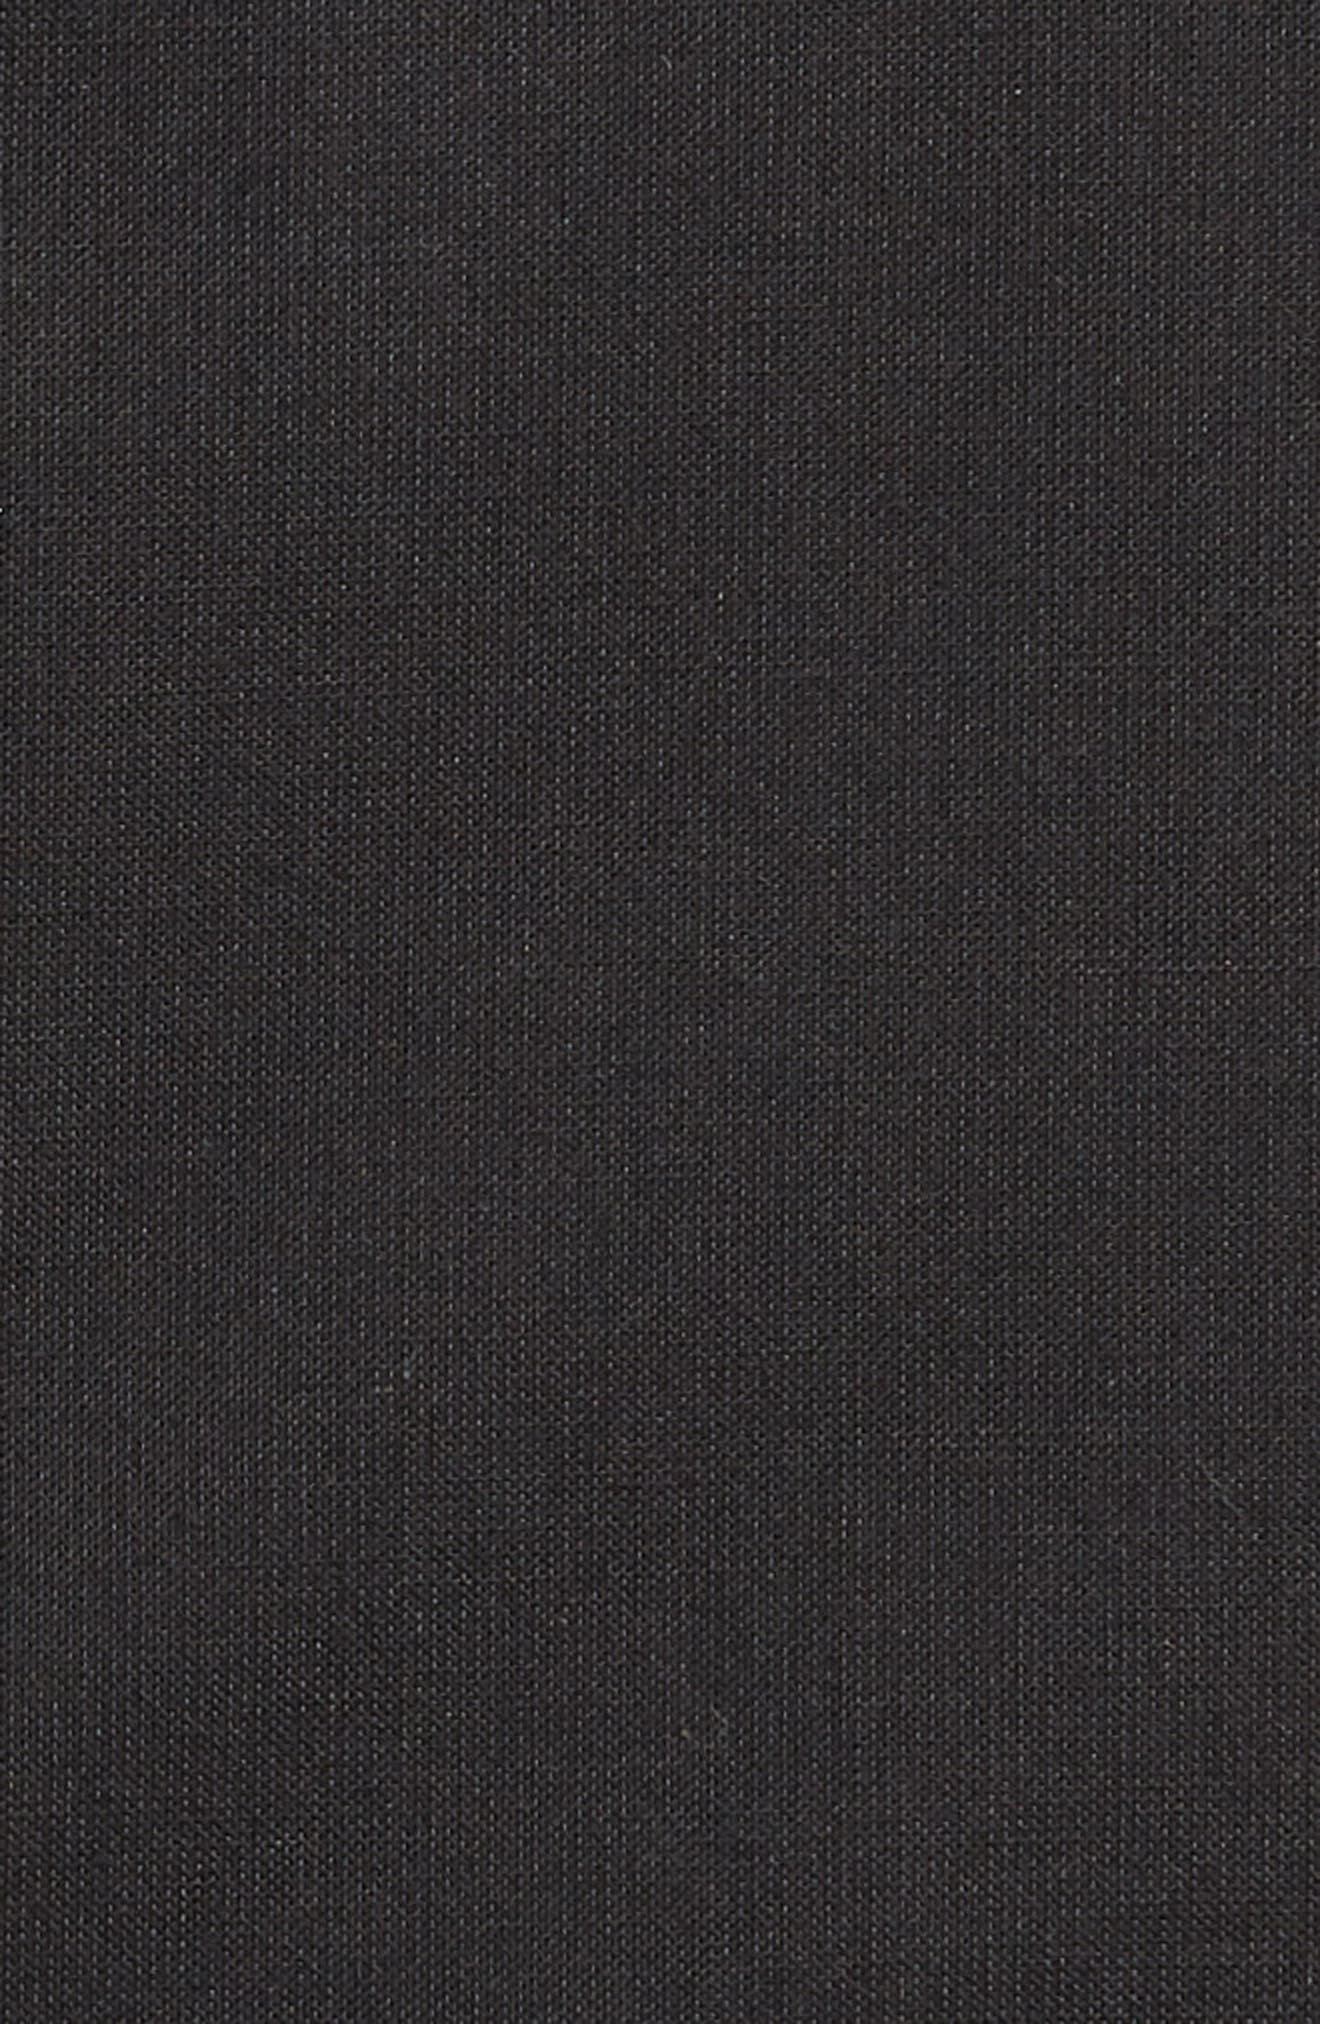 NORDSTROM MEN'S SHOP, Tech-Smart Traditional Fit Stretch Pinpoint Dress Shirt, Alternate thumbnail 6, color, BLACK ROCK